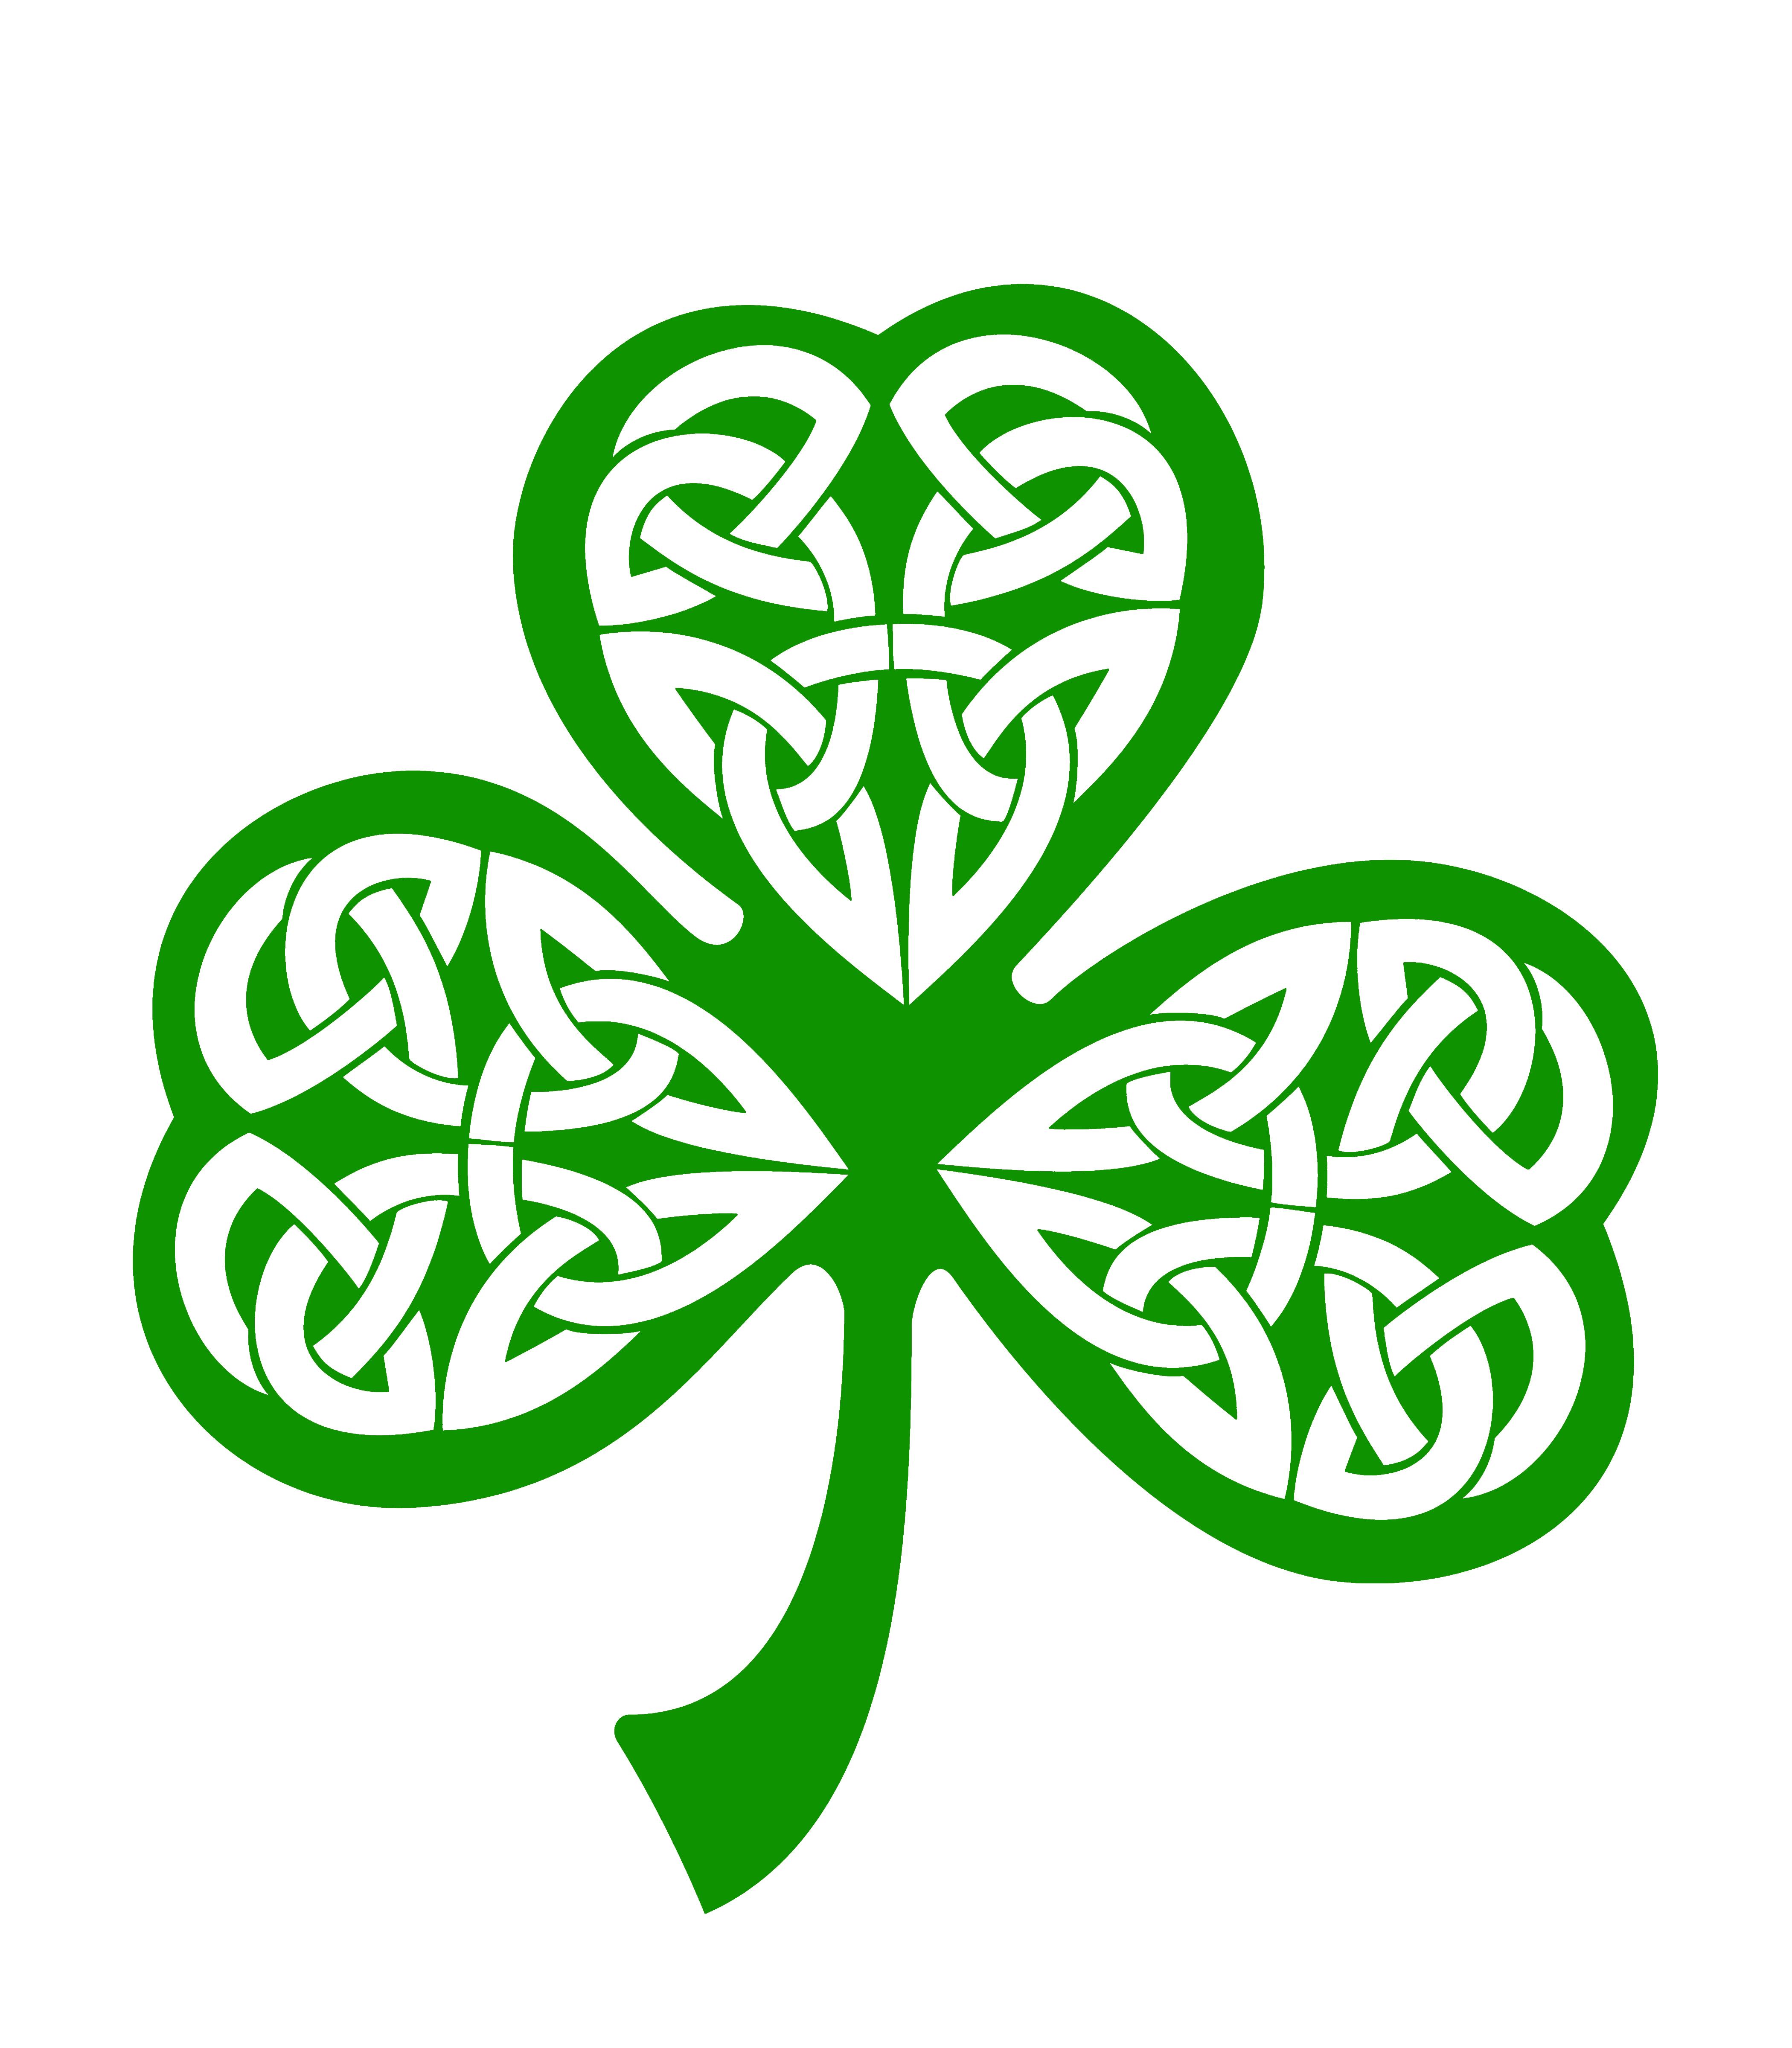 Celtic Knot clipart shamrock Wallpaper Wallpaper Wallpaper Irish